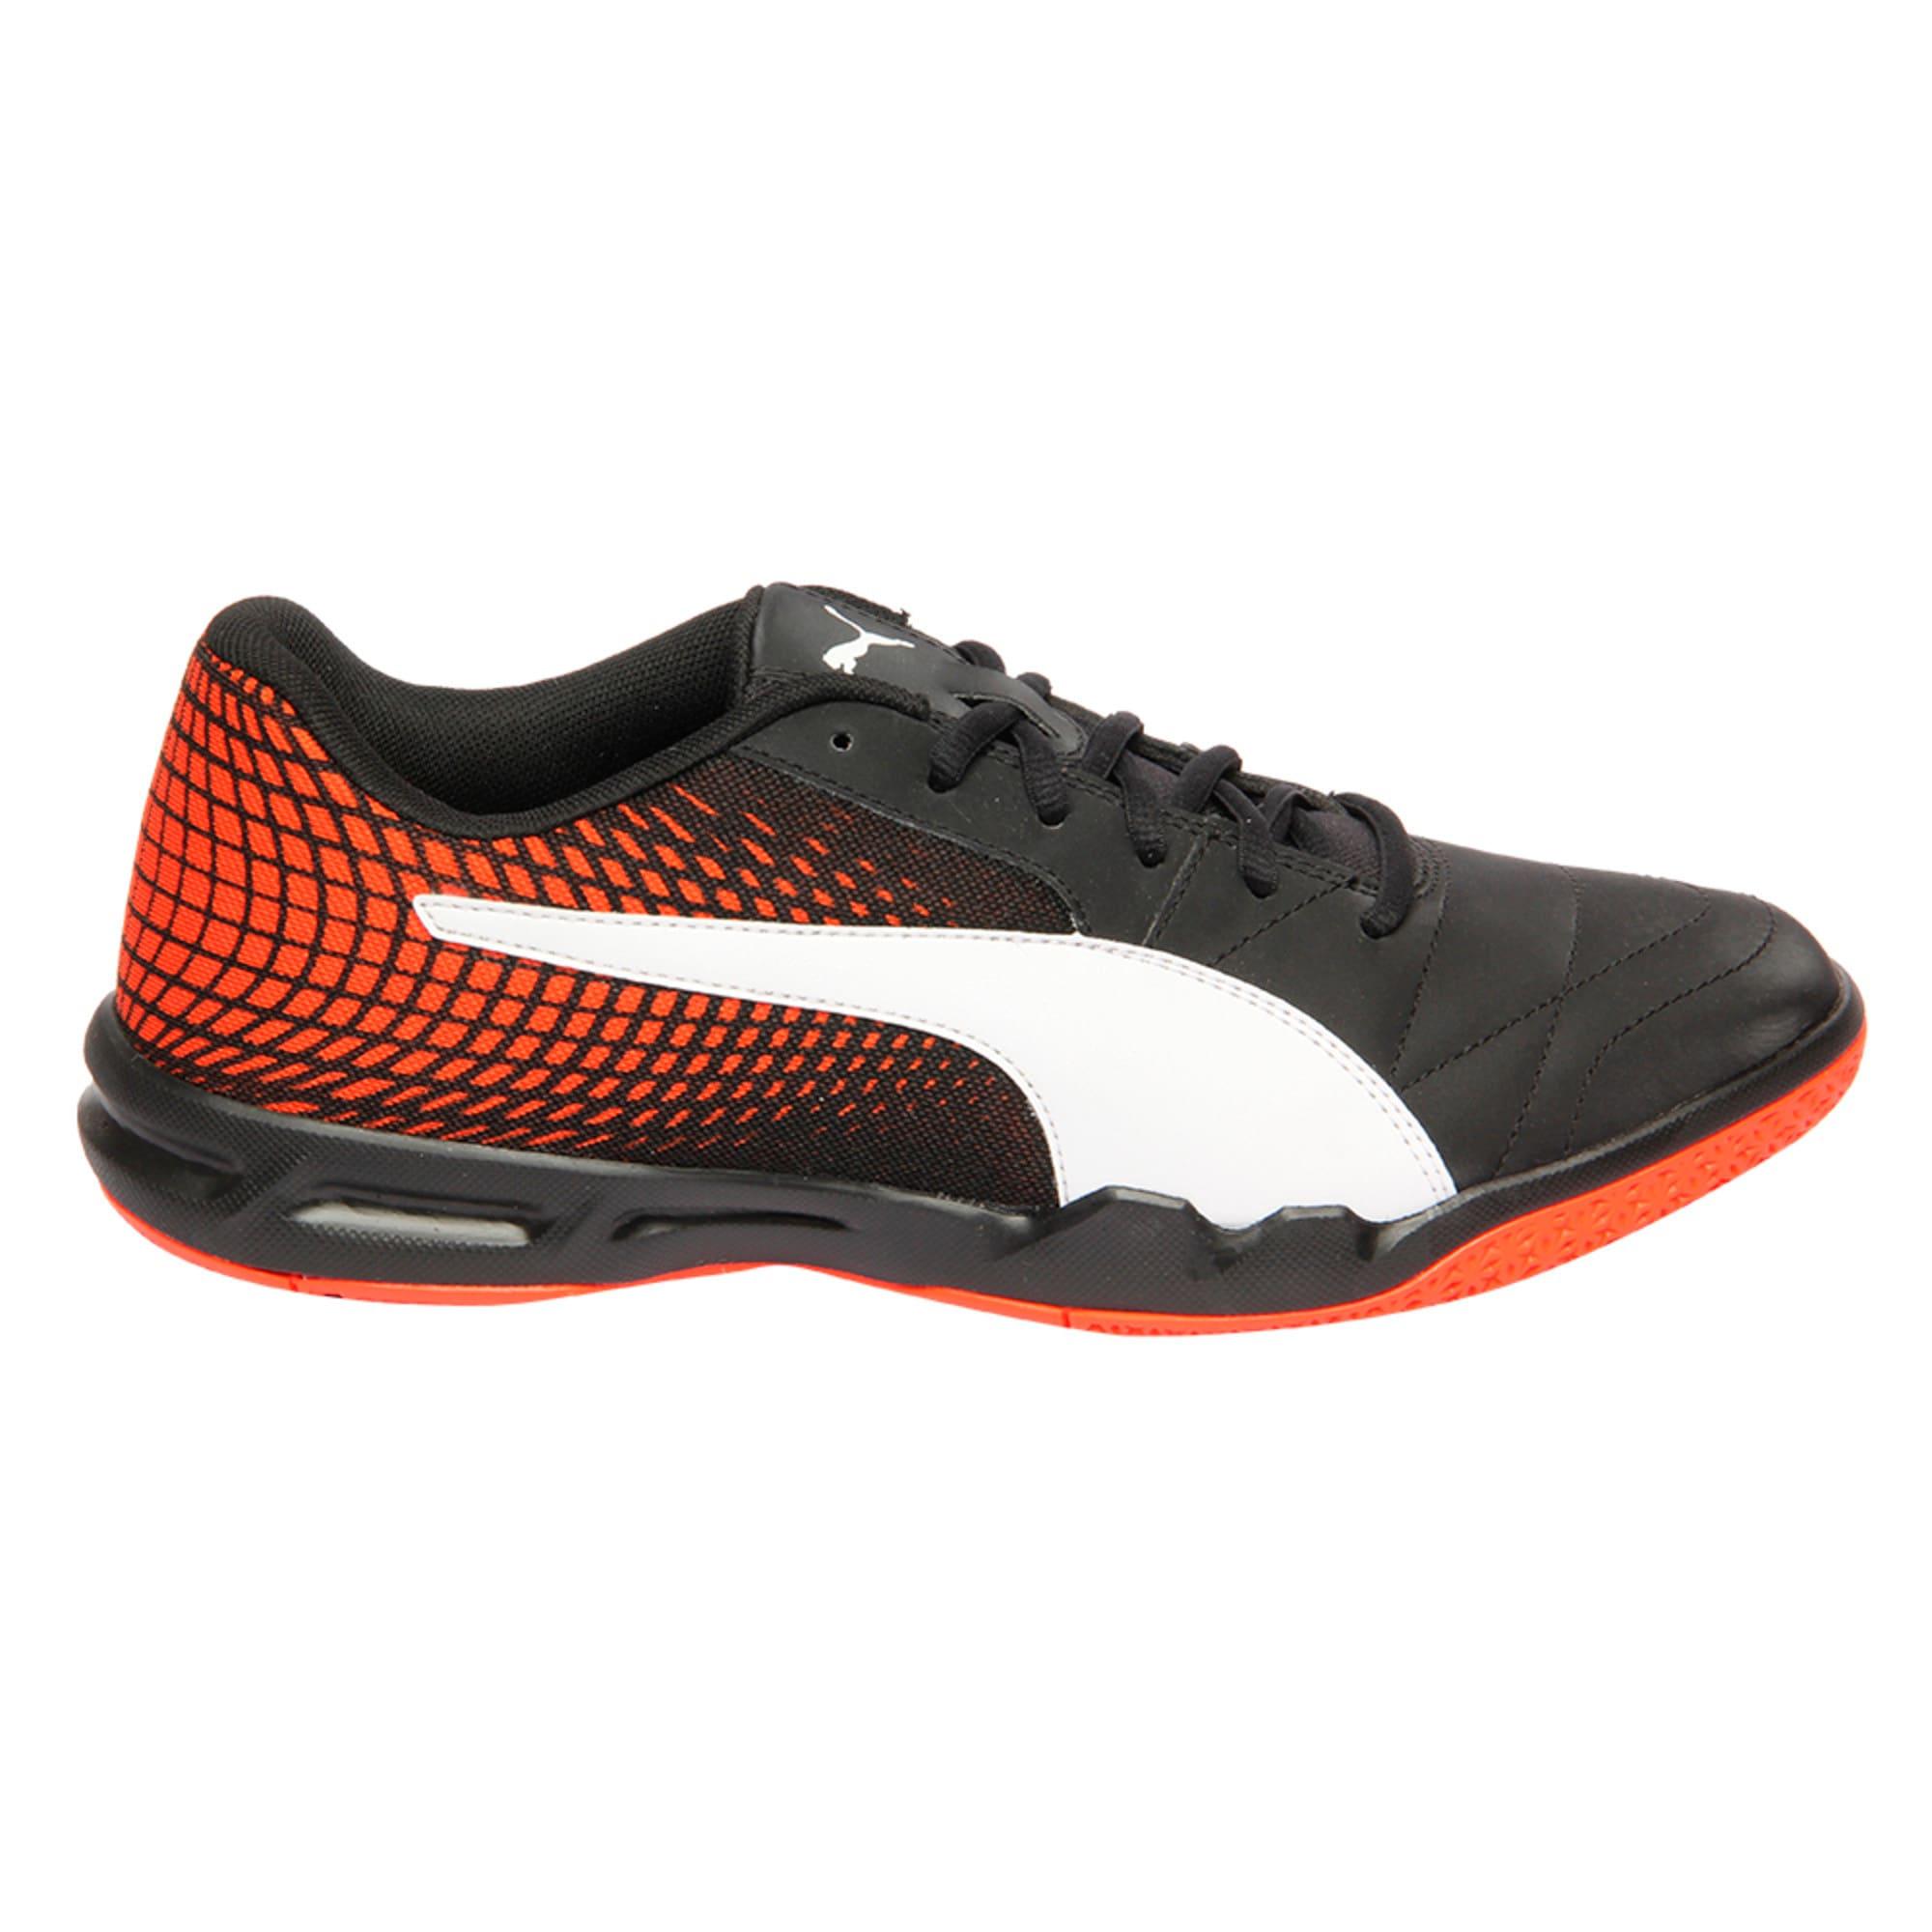 Thumbnail 5 of Veloz Indoor NG Training Shoes, Black-White-Cherry, medium-IND